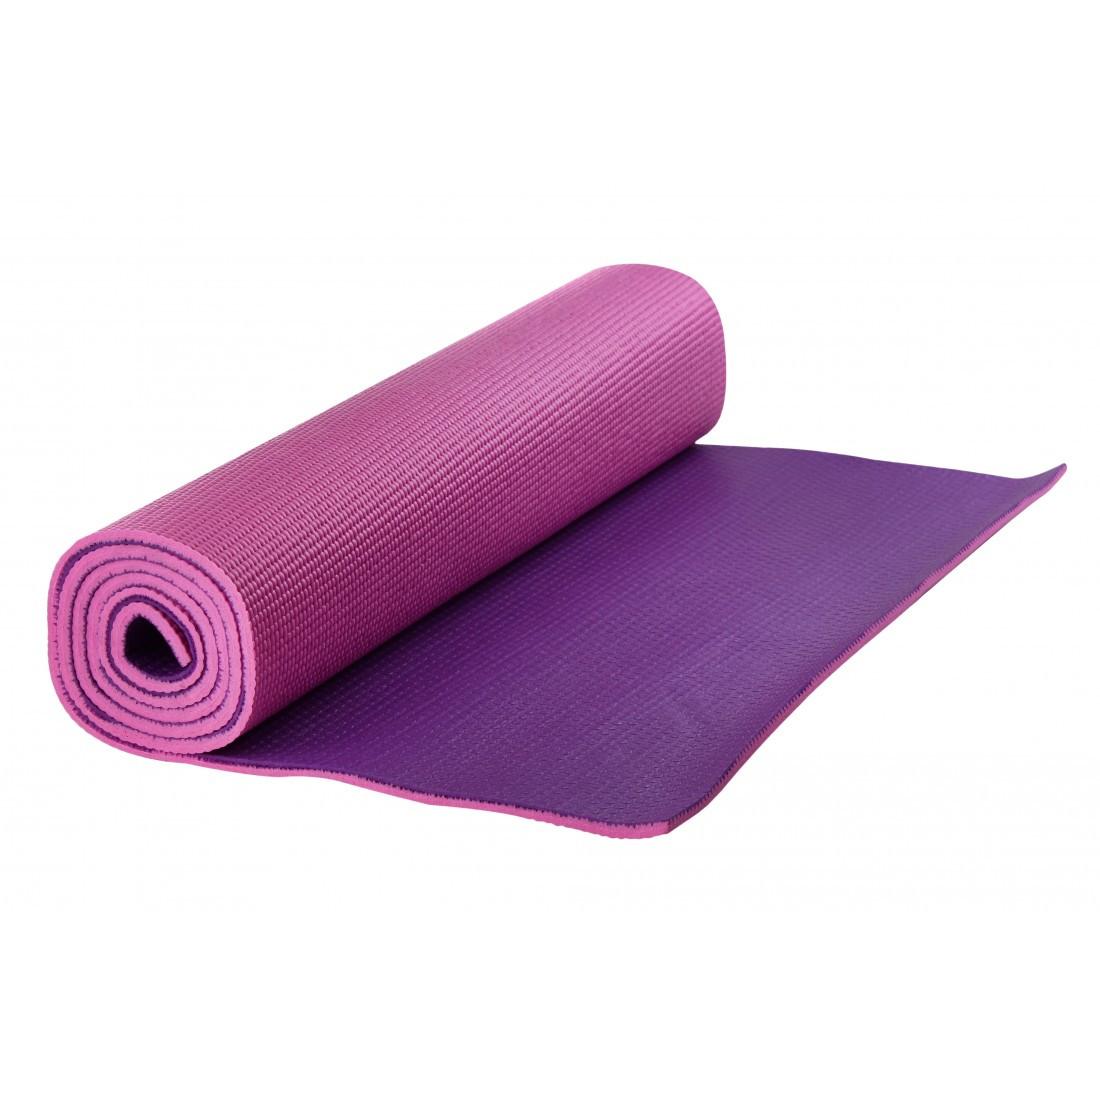 Коврик для йоги, пилатеса, фитнеса LiveUp 172x61x0,6см Maxed YOGA MAT в чехле (LS3231-06p_